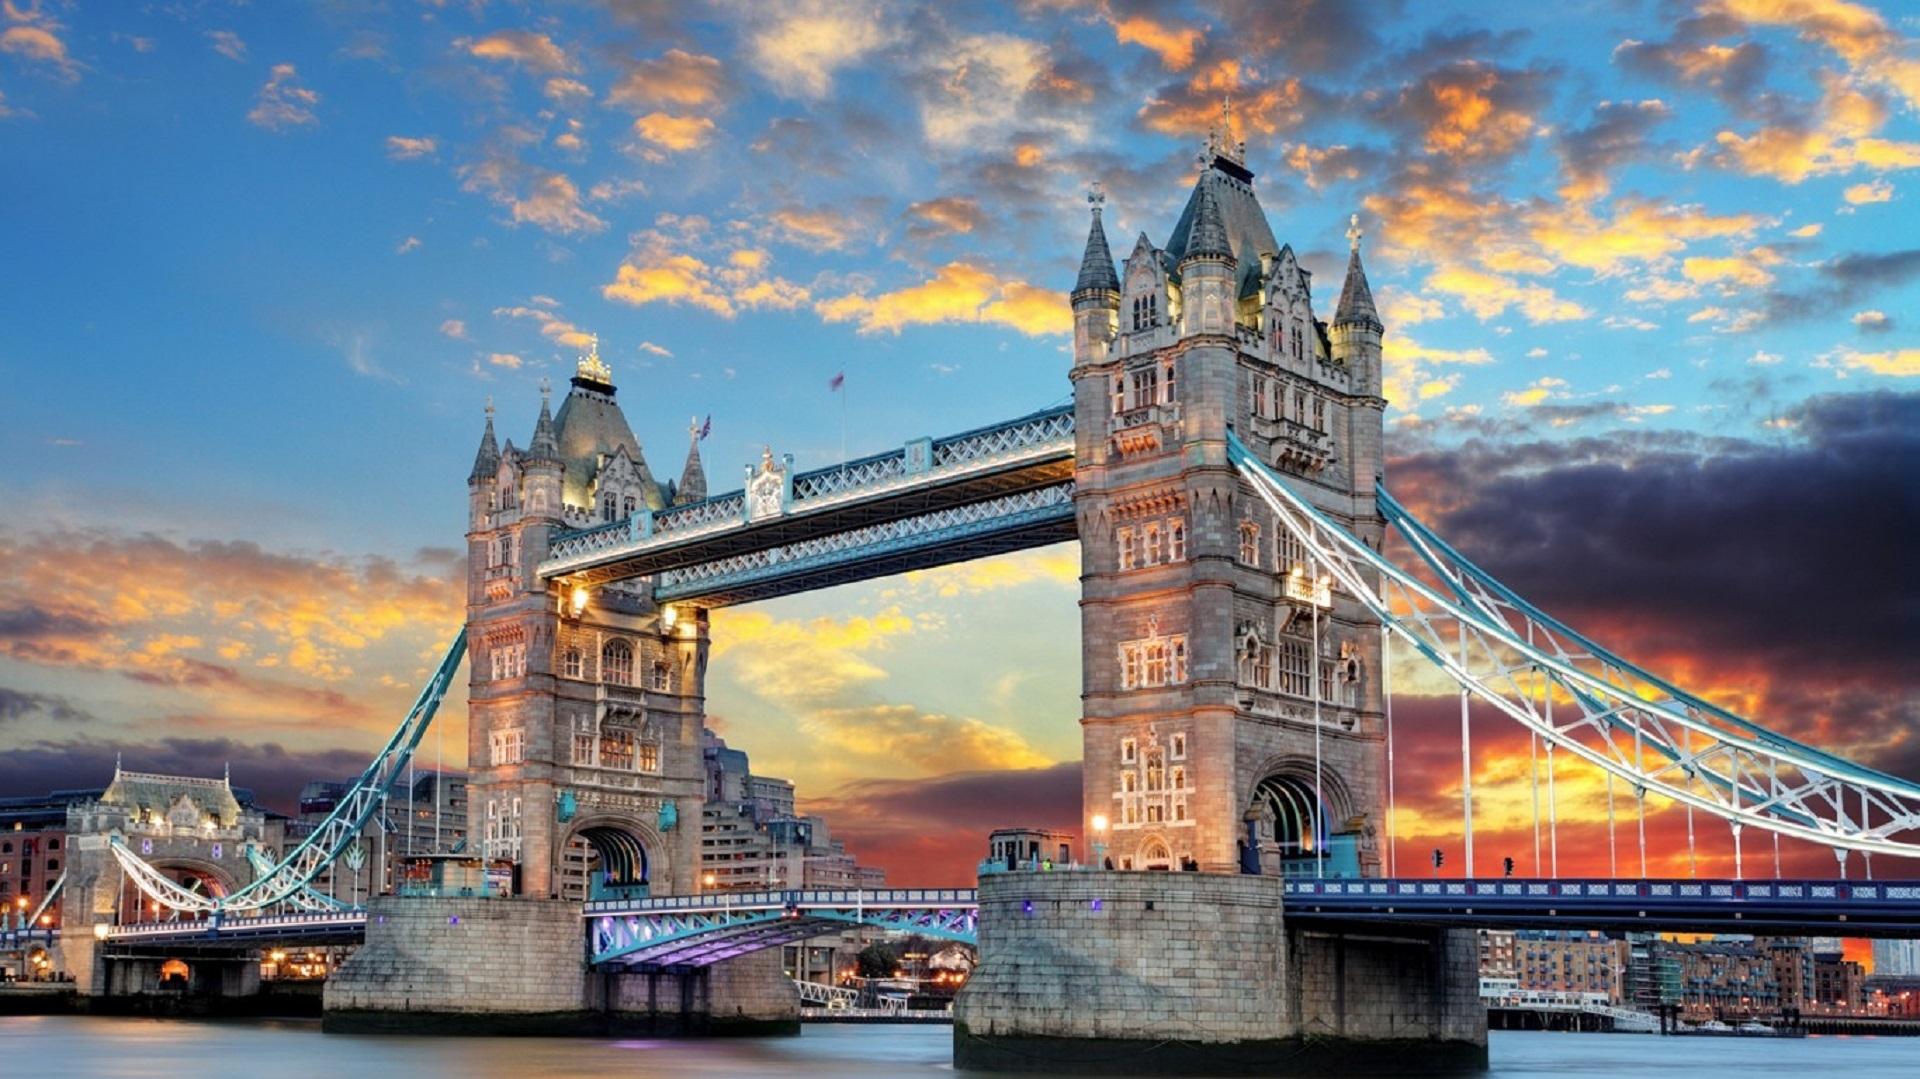 UK tower bridge